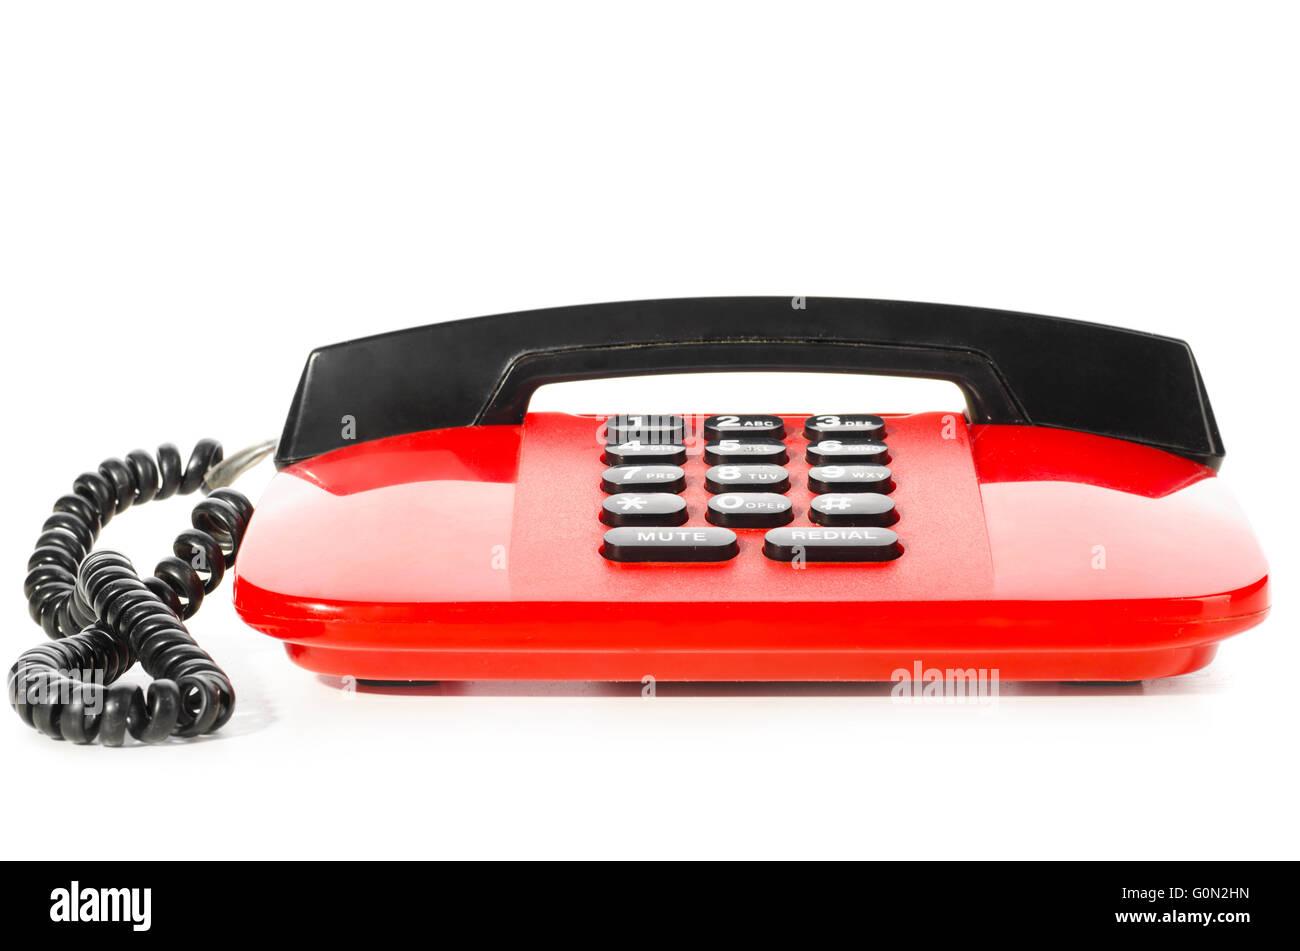 red desk phone Stock Photo